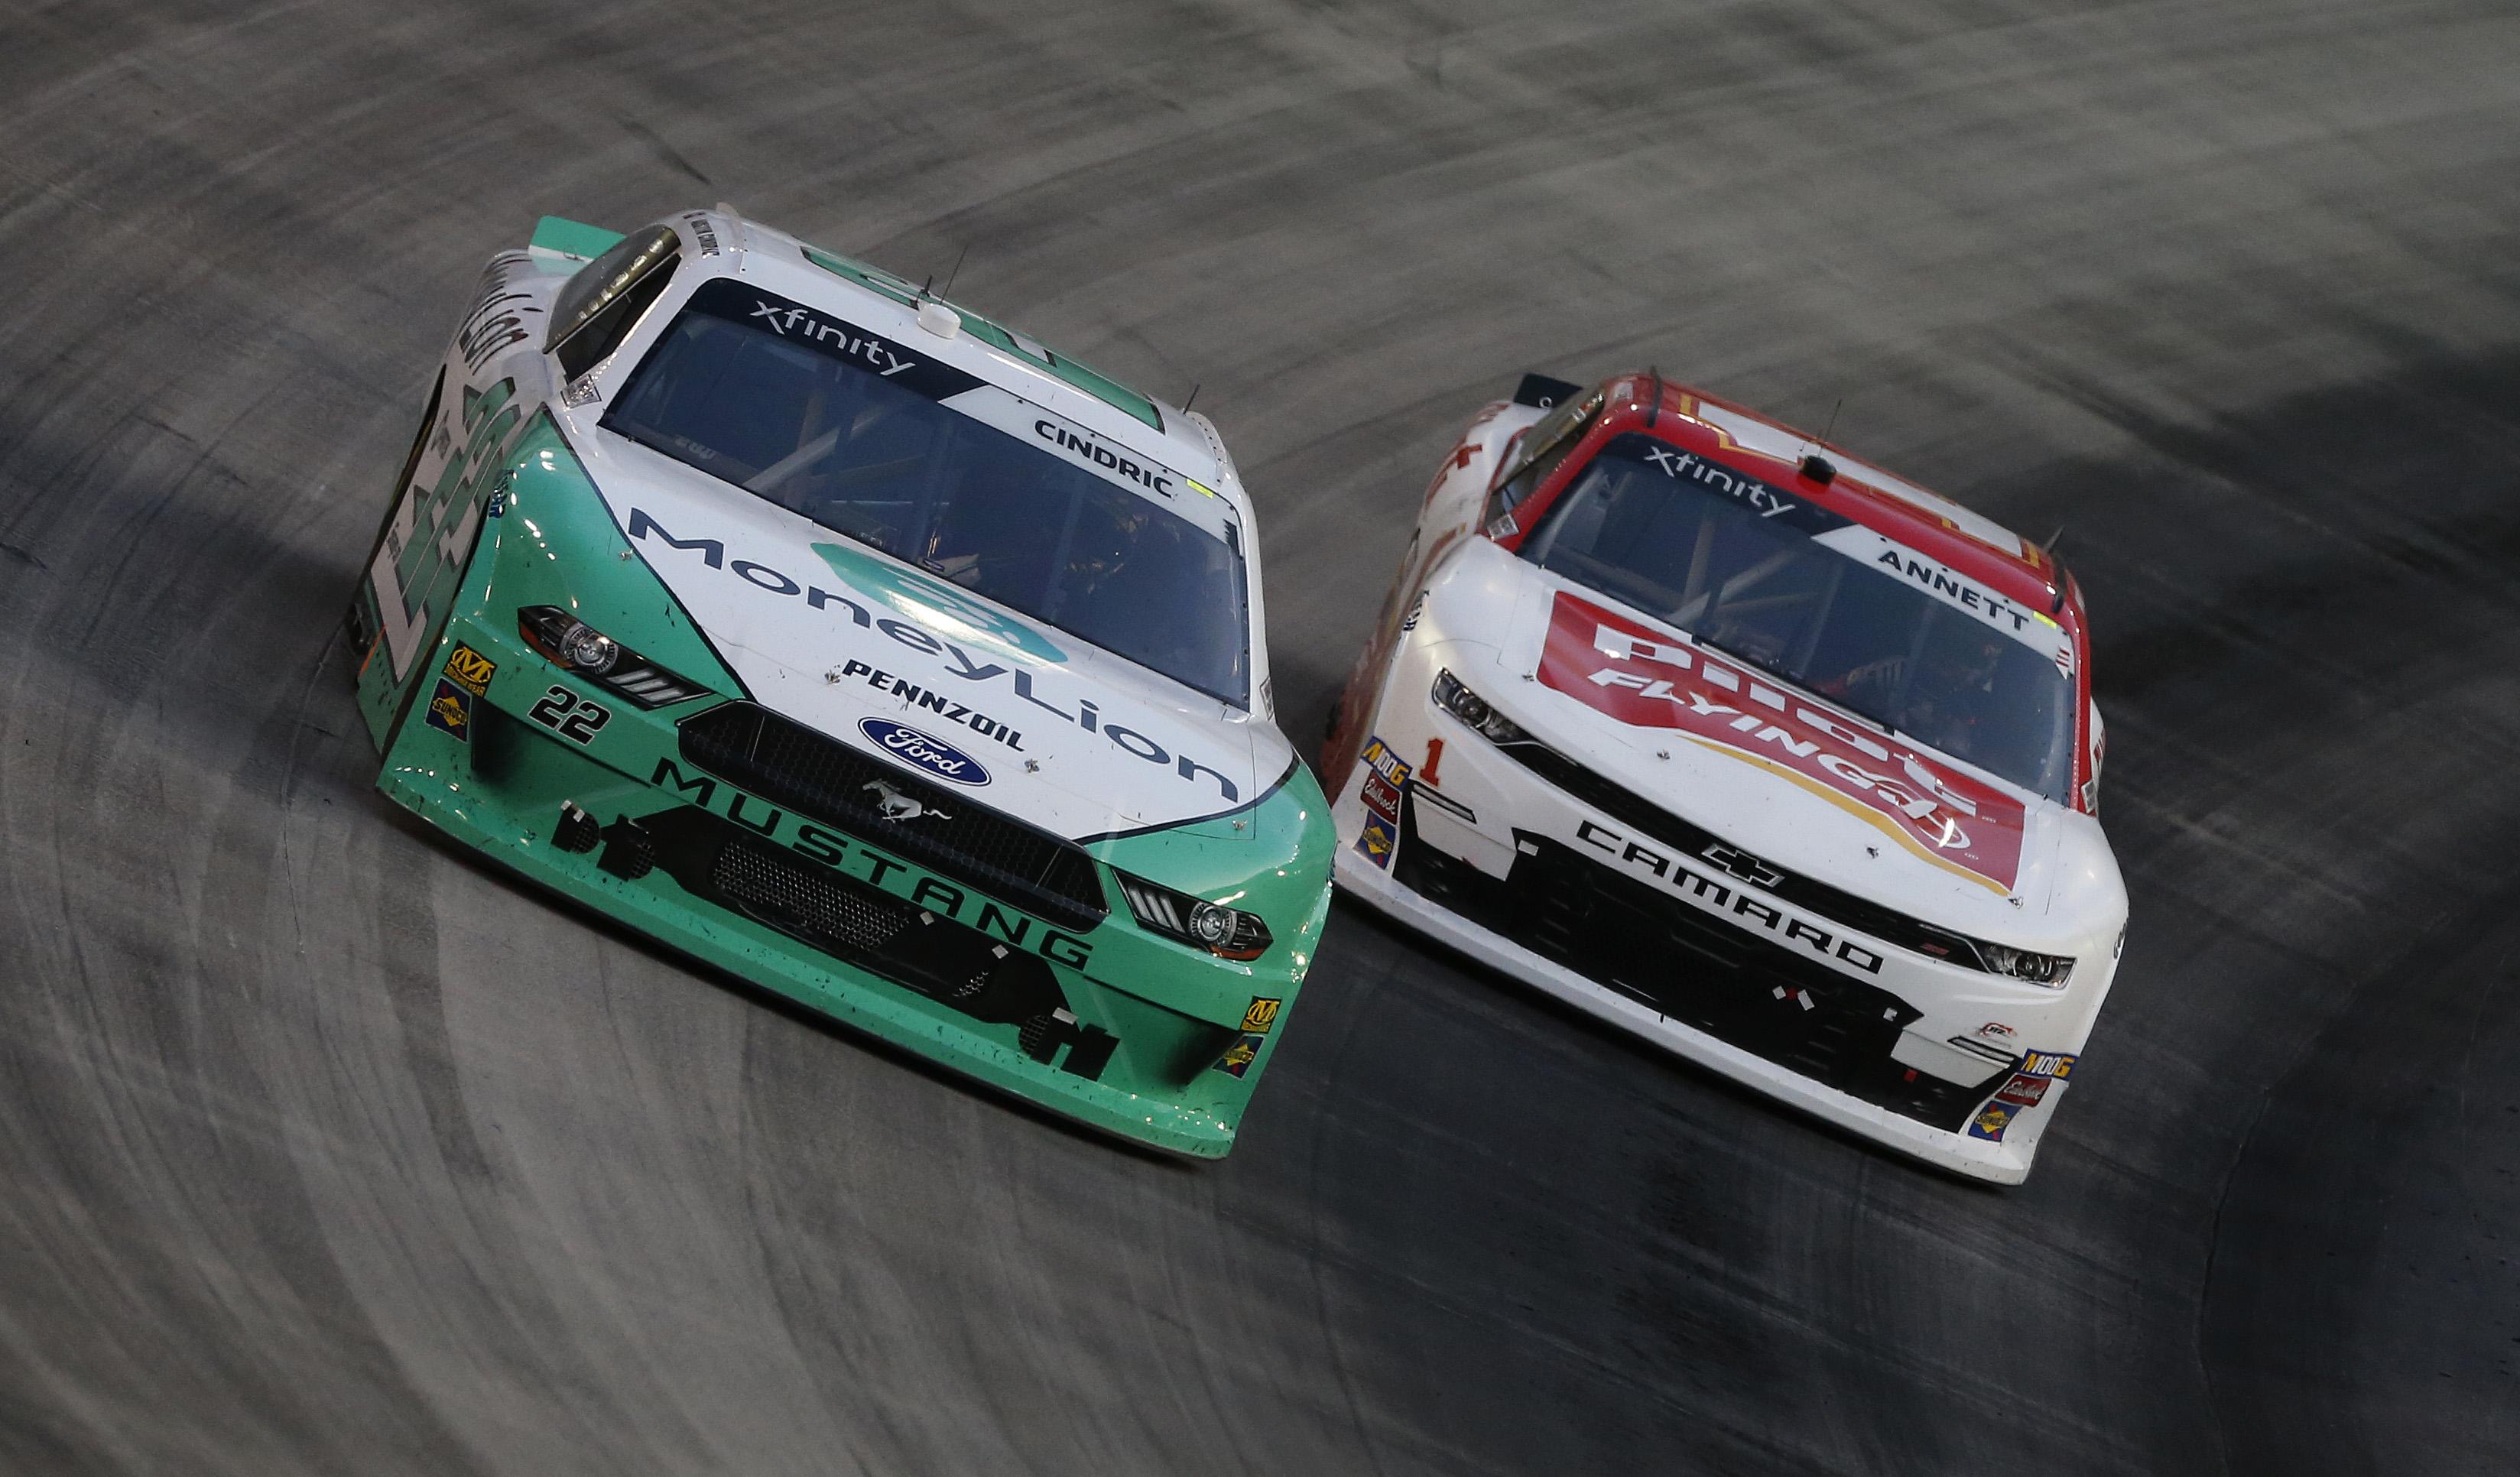 CTECH Manufacturing 180 at Road America: 2019 NASCAR® FANTASY DRIVER RANKINGS – DraftKings Playbook